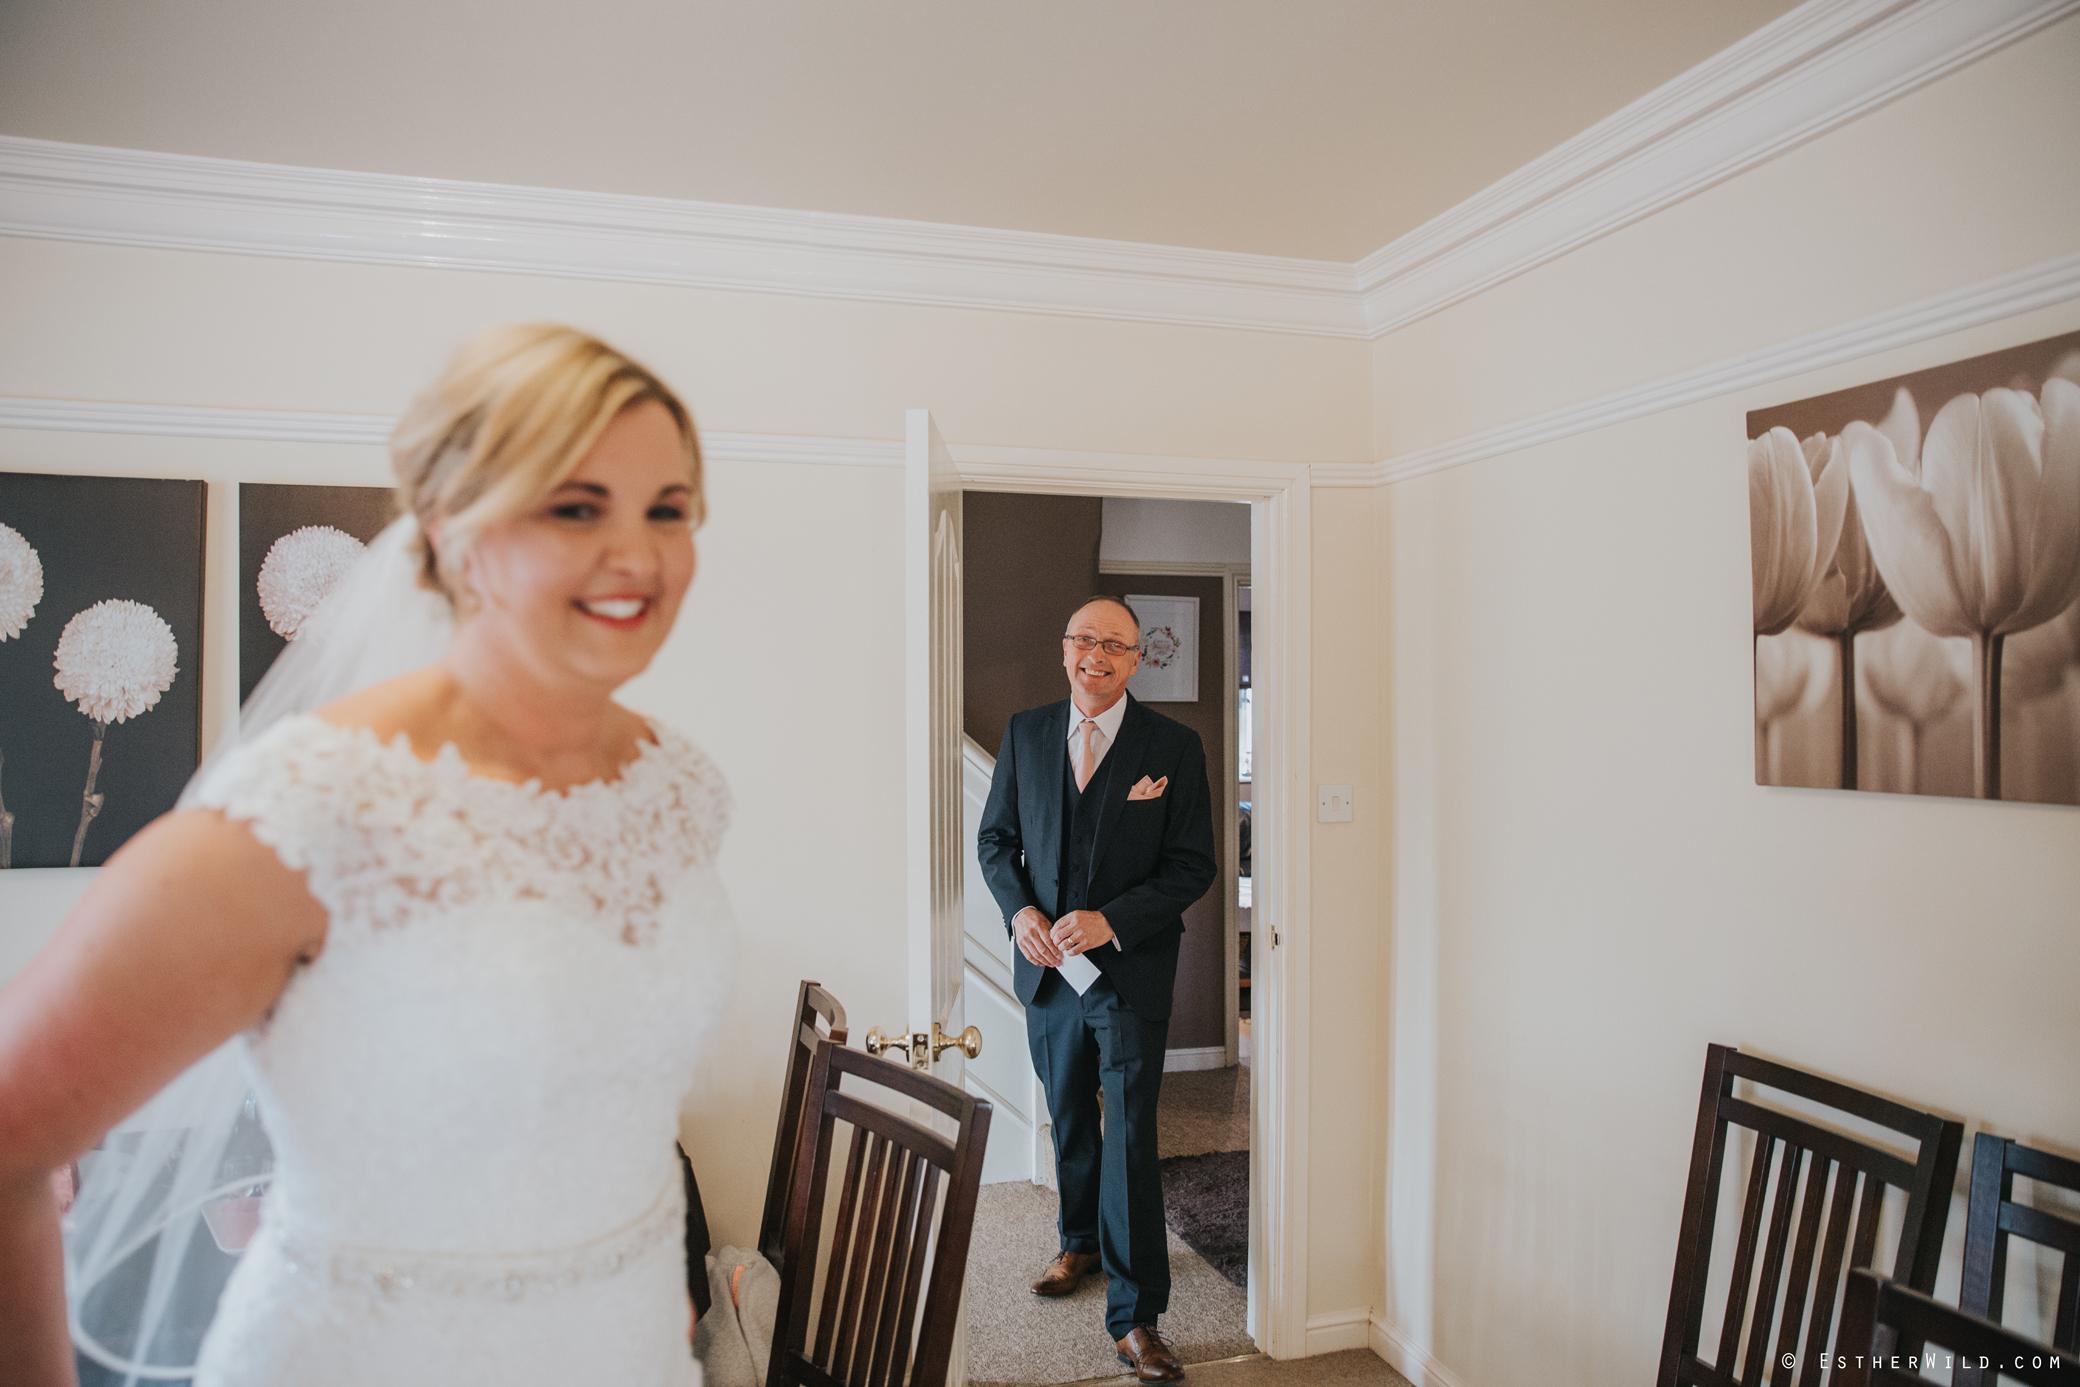 Wedding_Kings_Lynn_Town_Hall_Norfolk_Photographer_Esther_Wild_IMG_0577.jpg